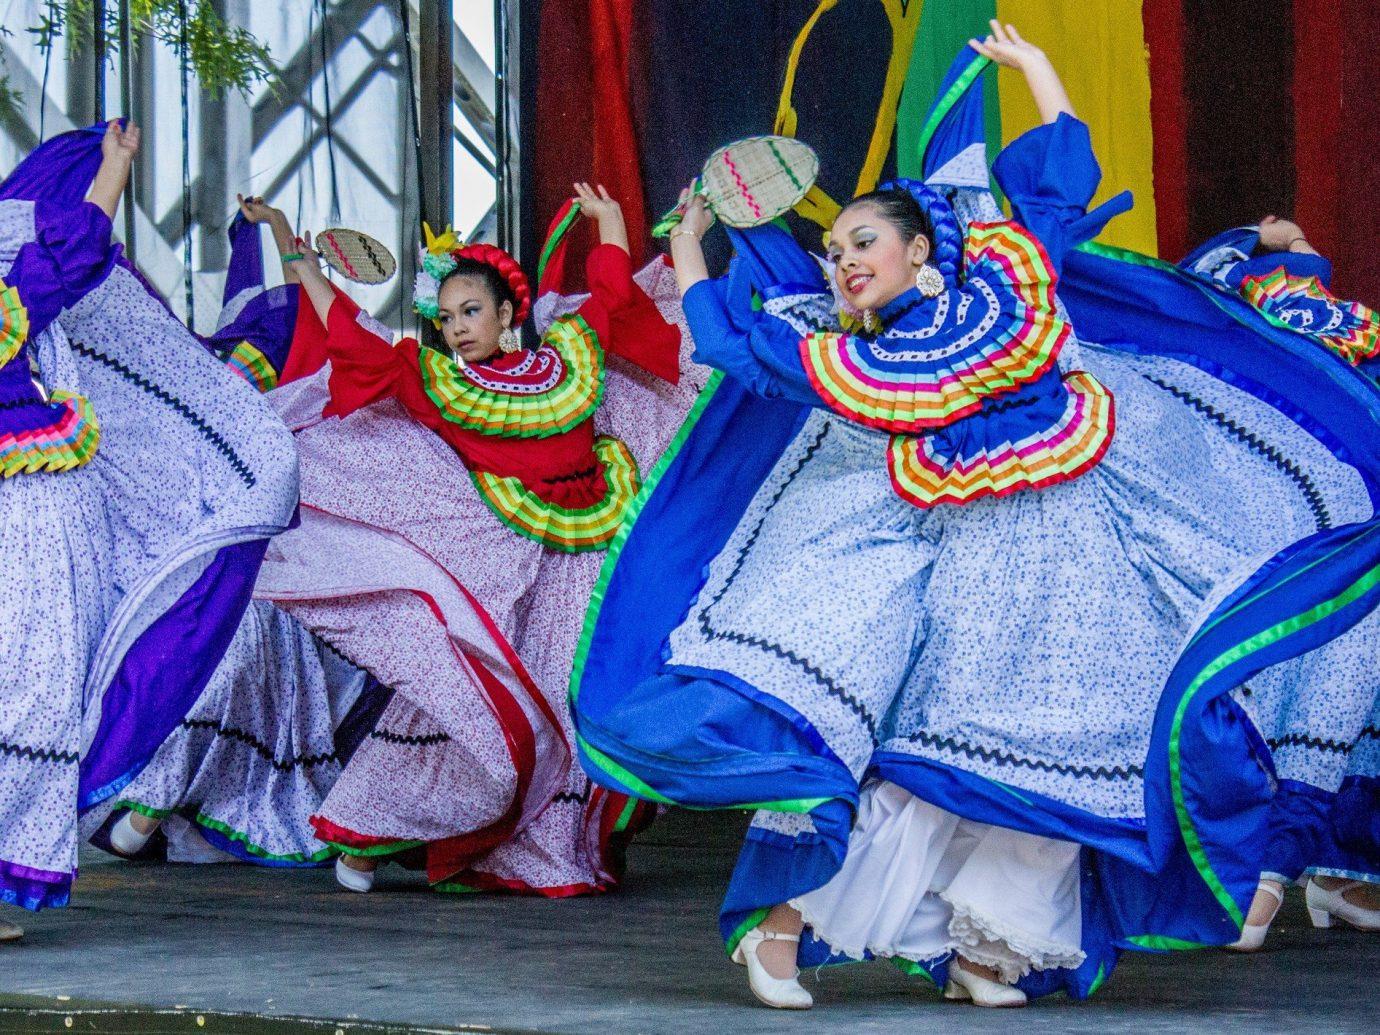 Trip Ideas dance performing arts performance art carnival event folk dance festival sports musical theatre colorful